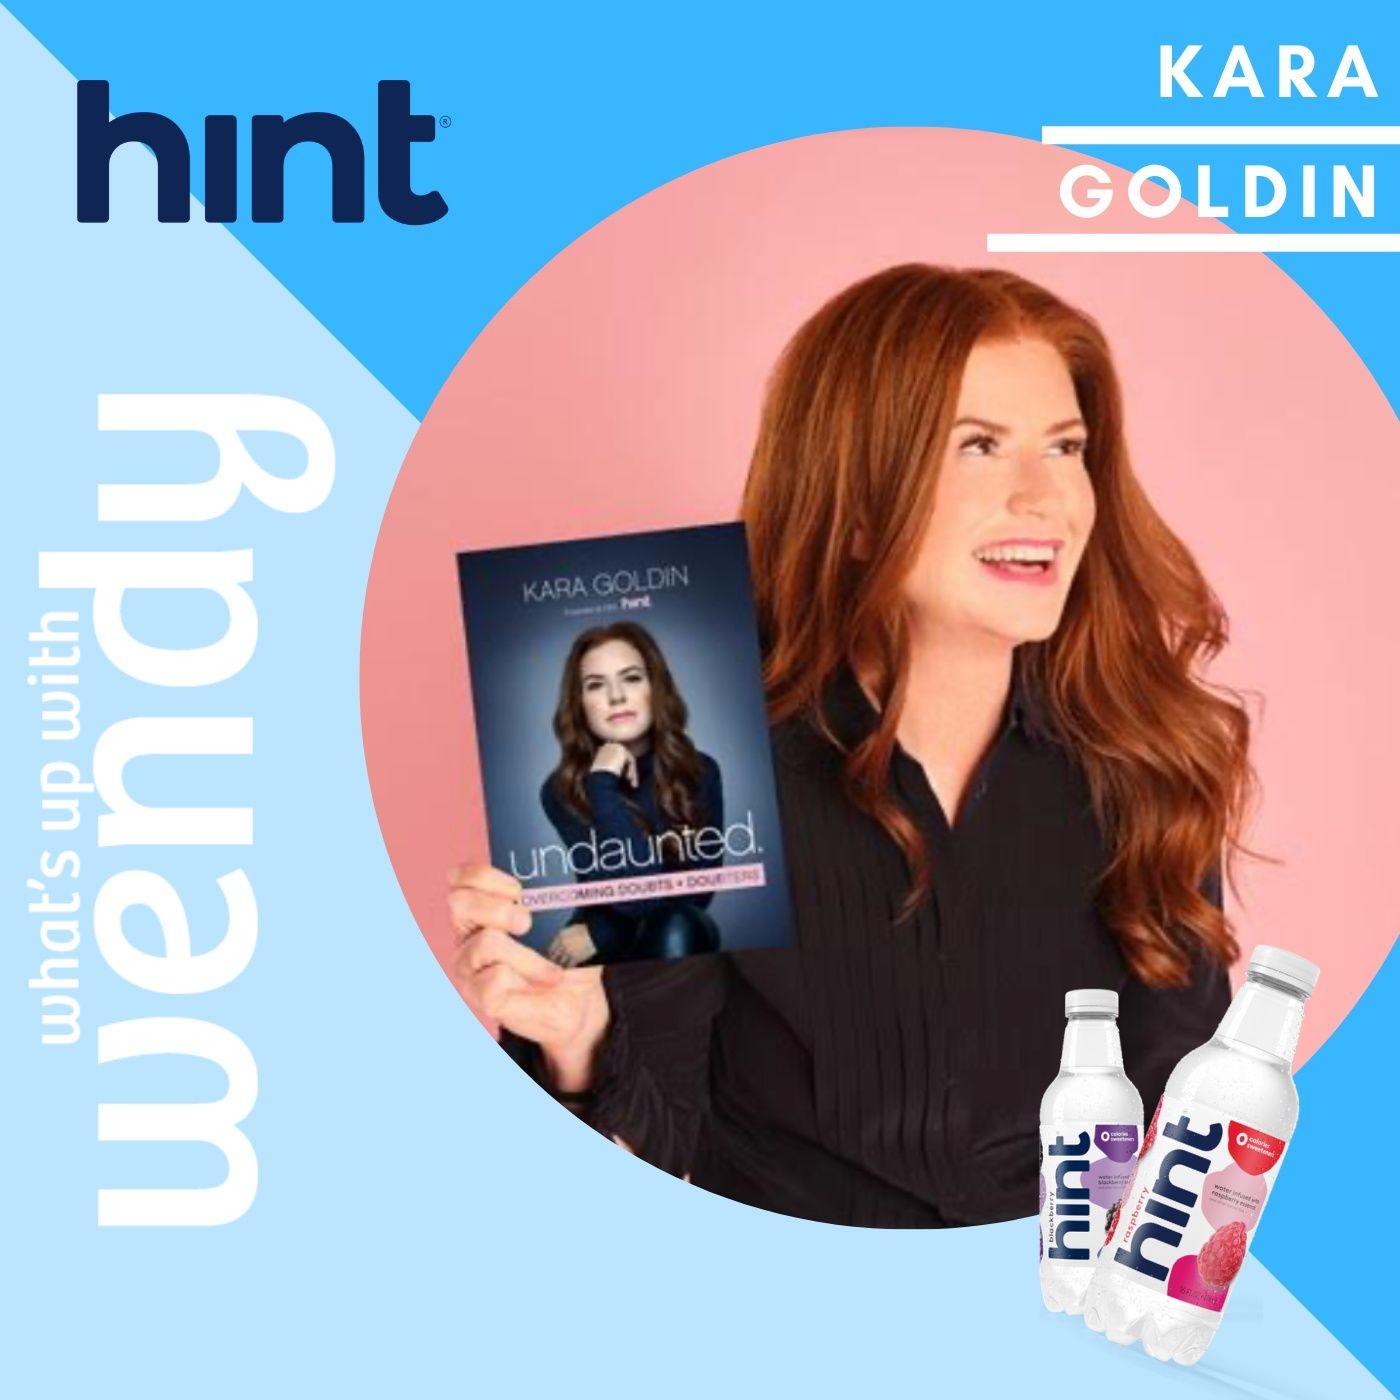 Kara Goldin, Entrepreneur & CEO Hint Water